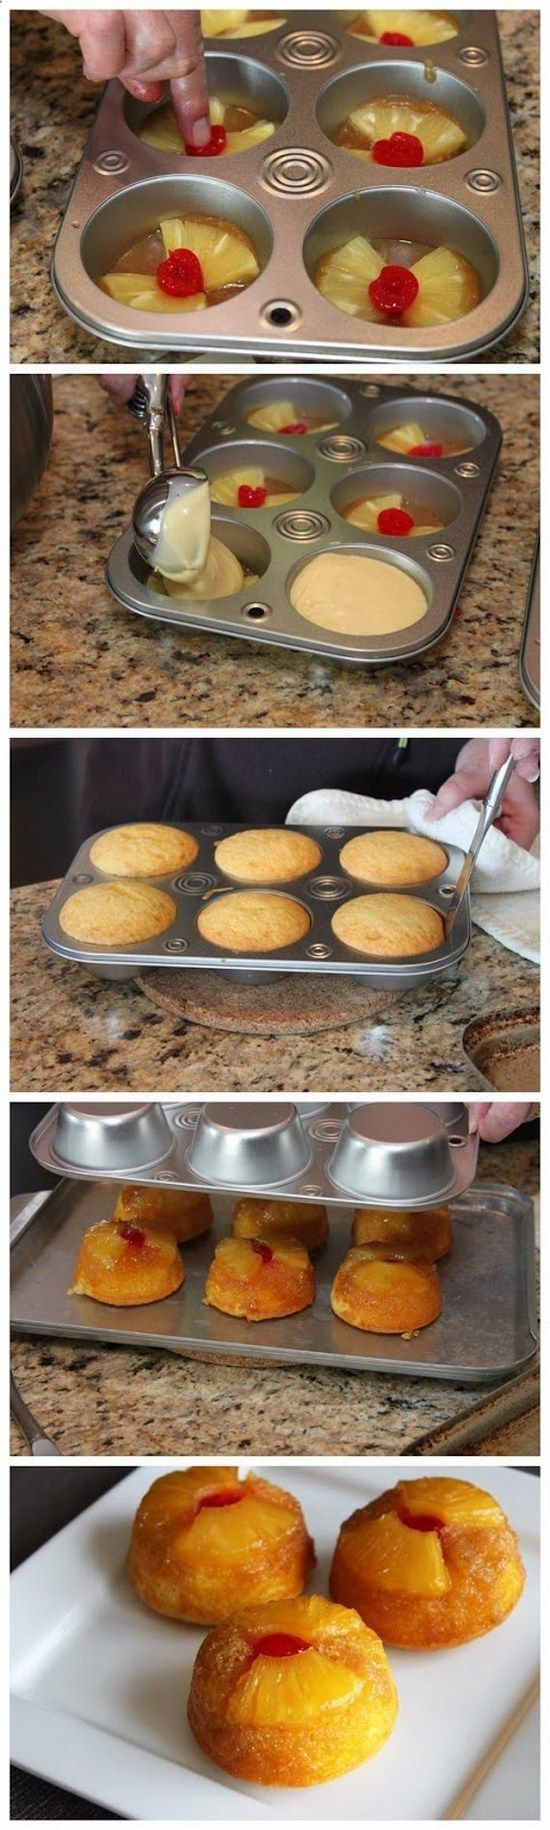 Pineapple Upside-Down Cupcakes | Chef recipes magazineChef recipes magazine